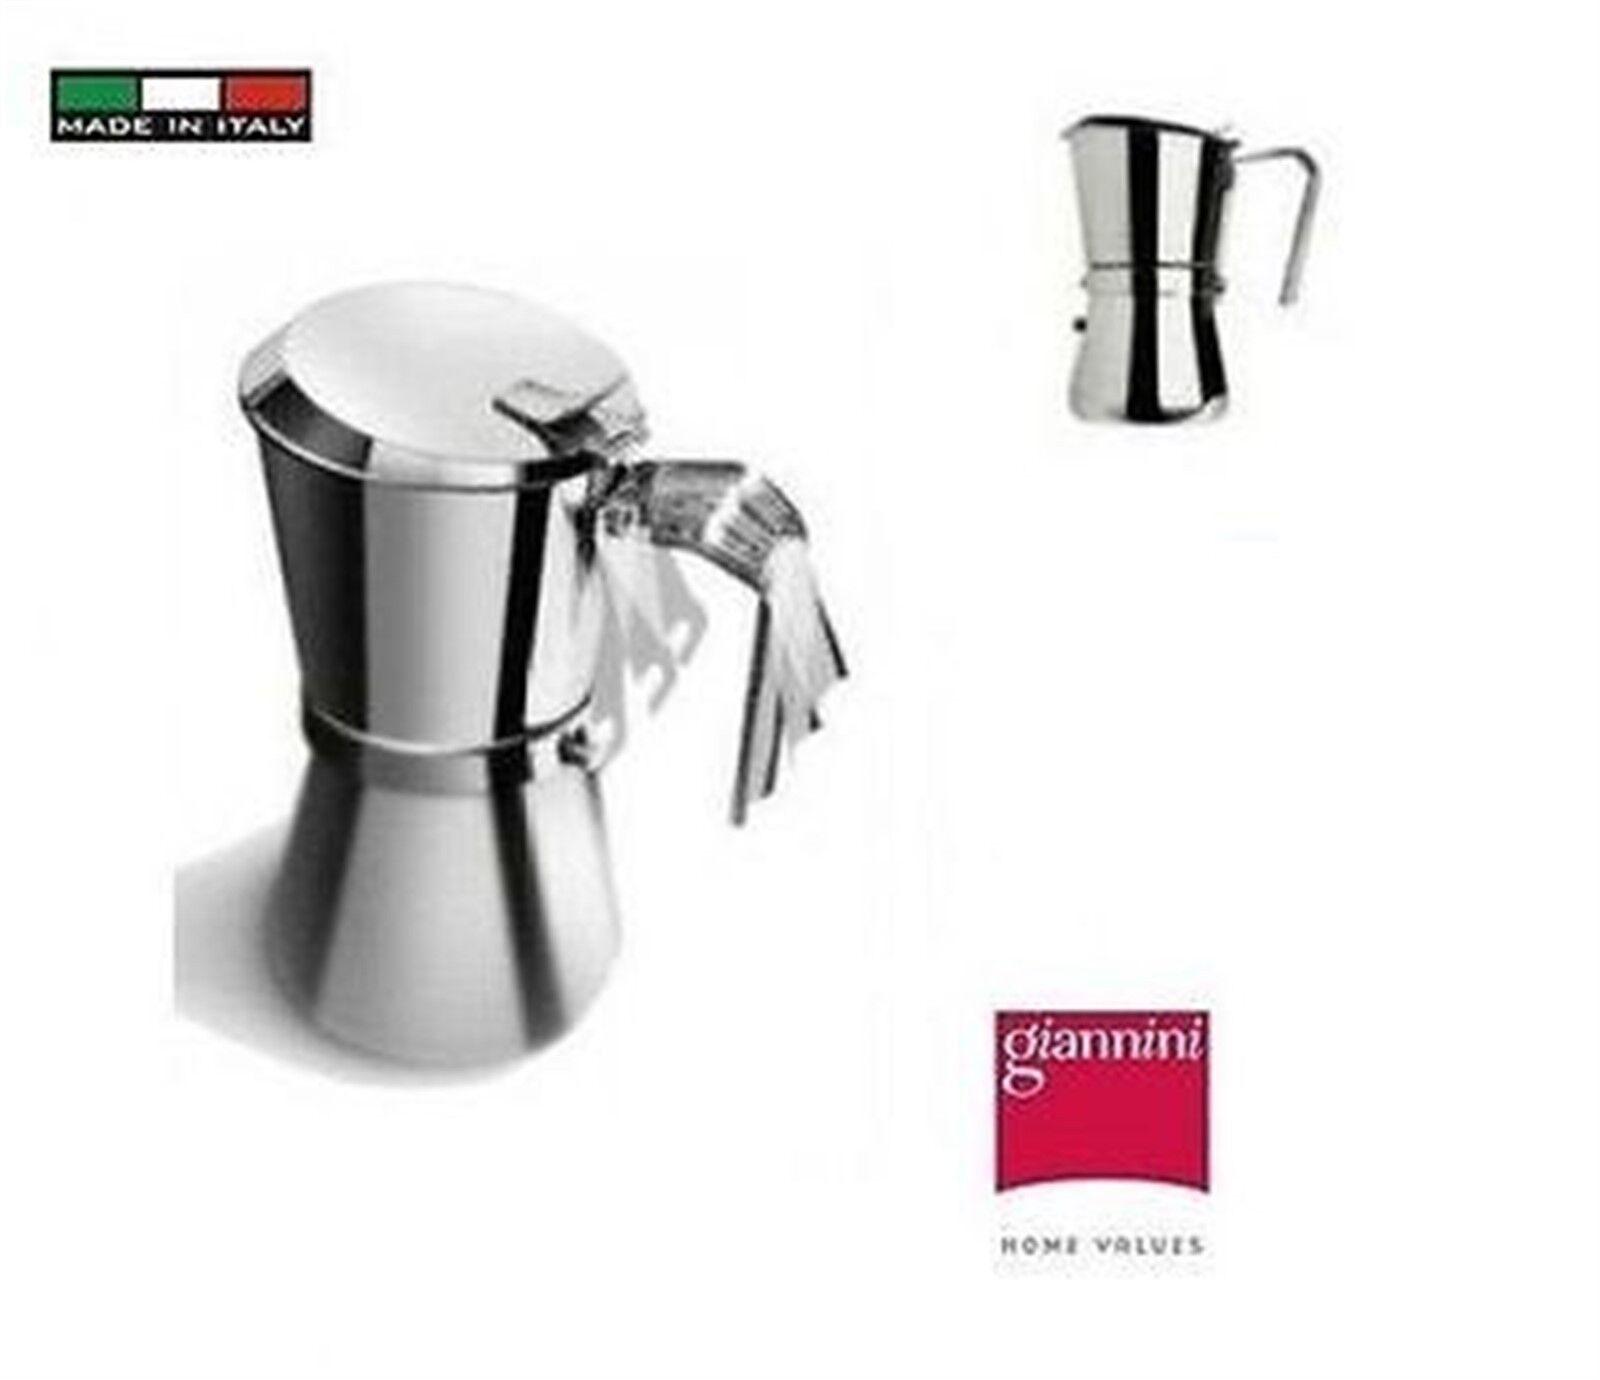 Giannini   101   Giannina    caffettiera inox  1 tazza  (Made in )